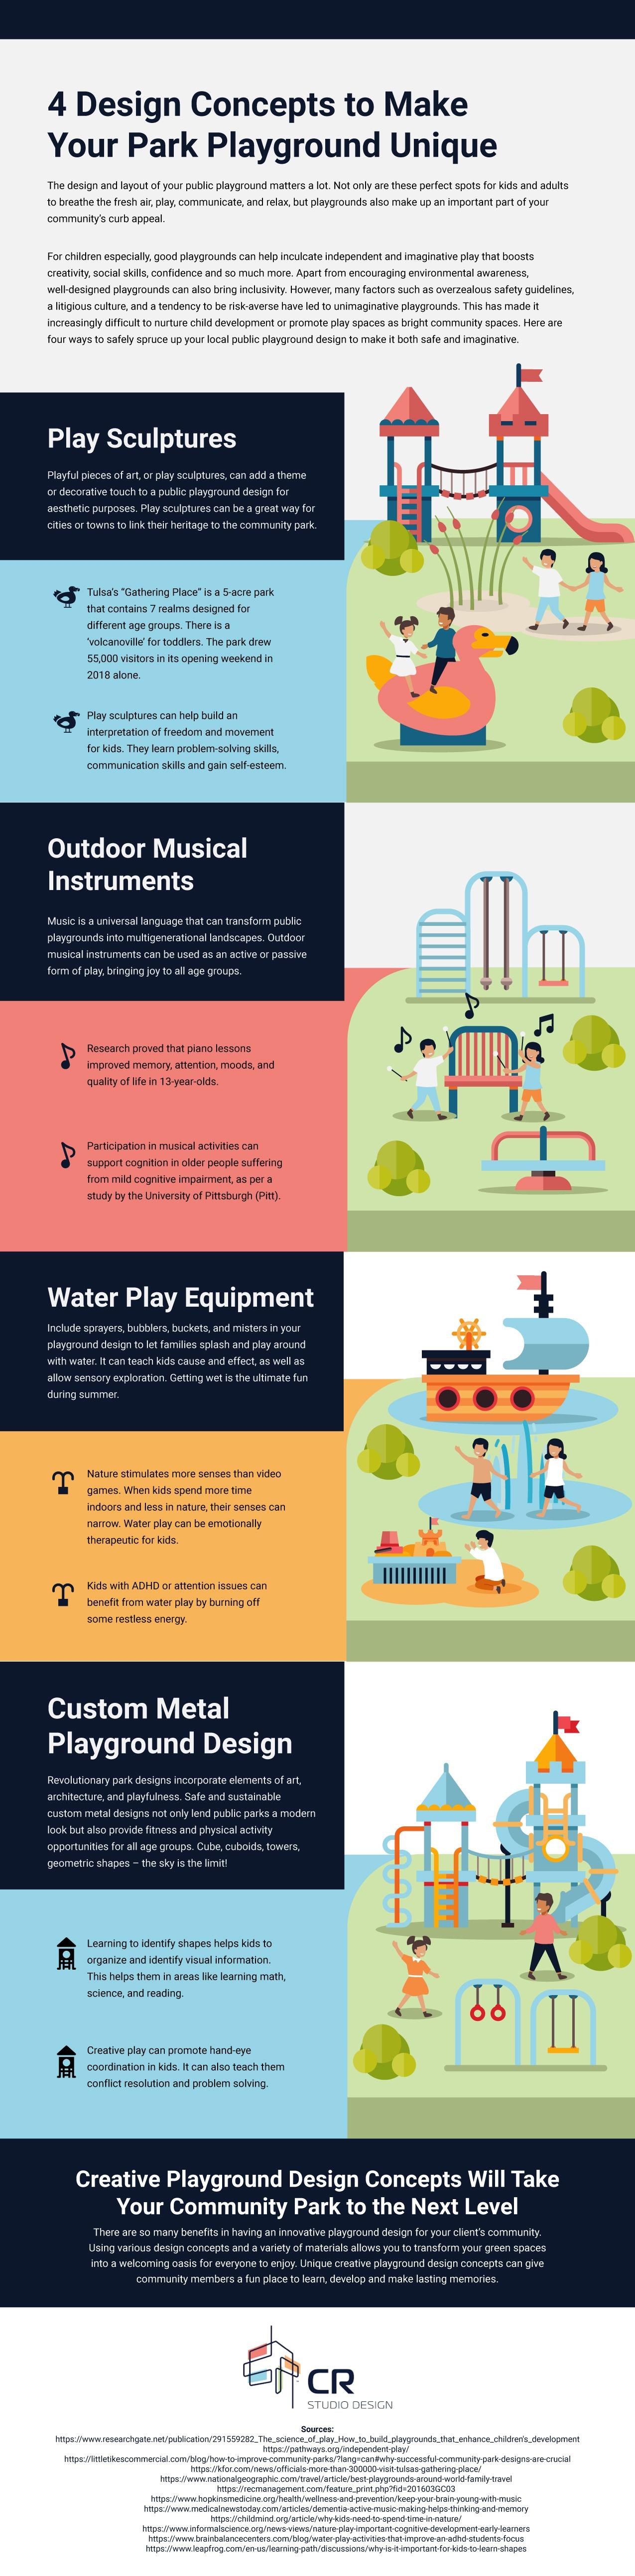 4 Design Concepts to Make Your Park Playground Unique